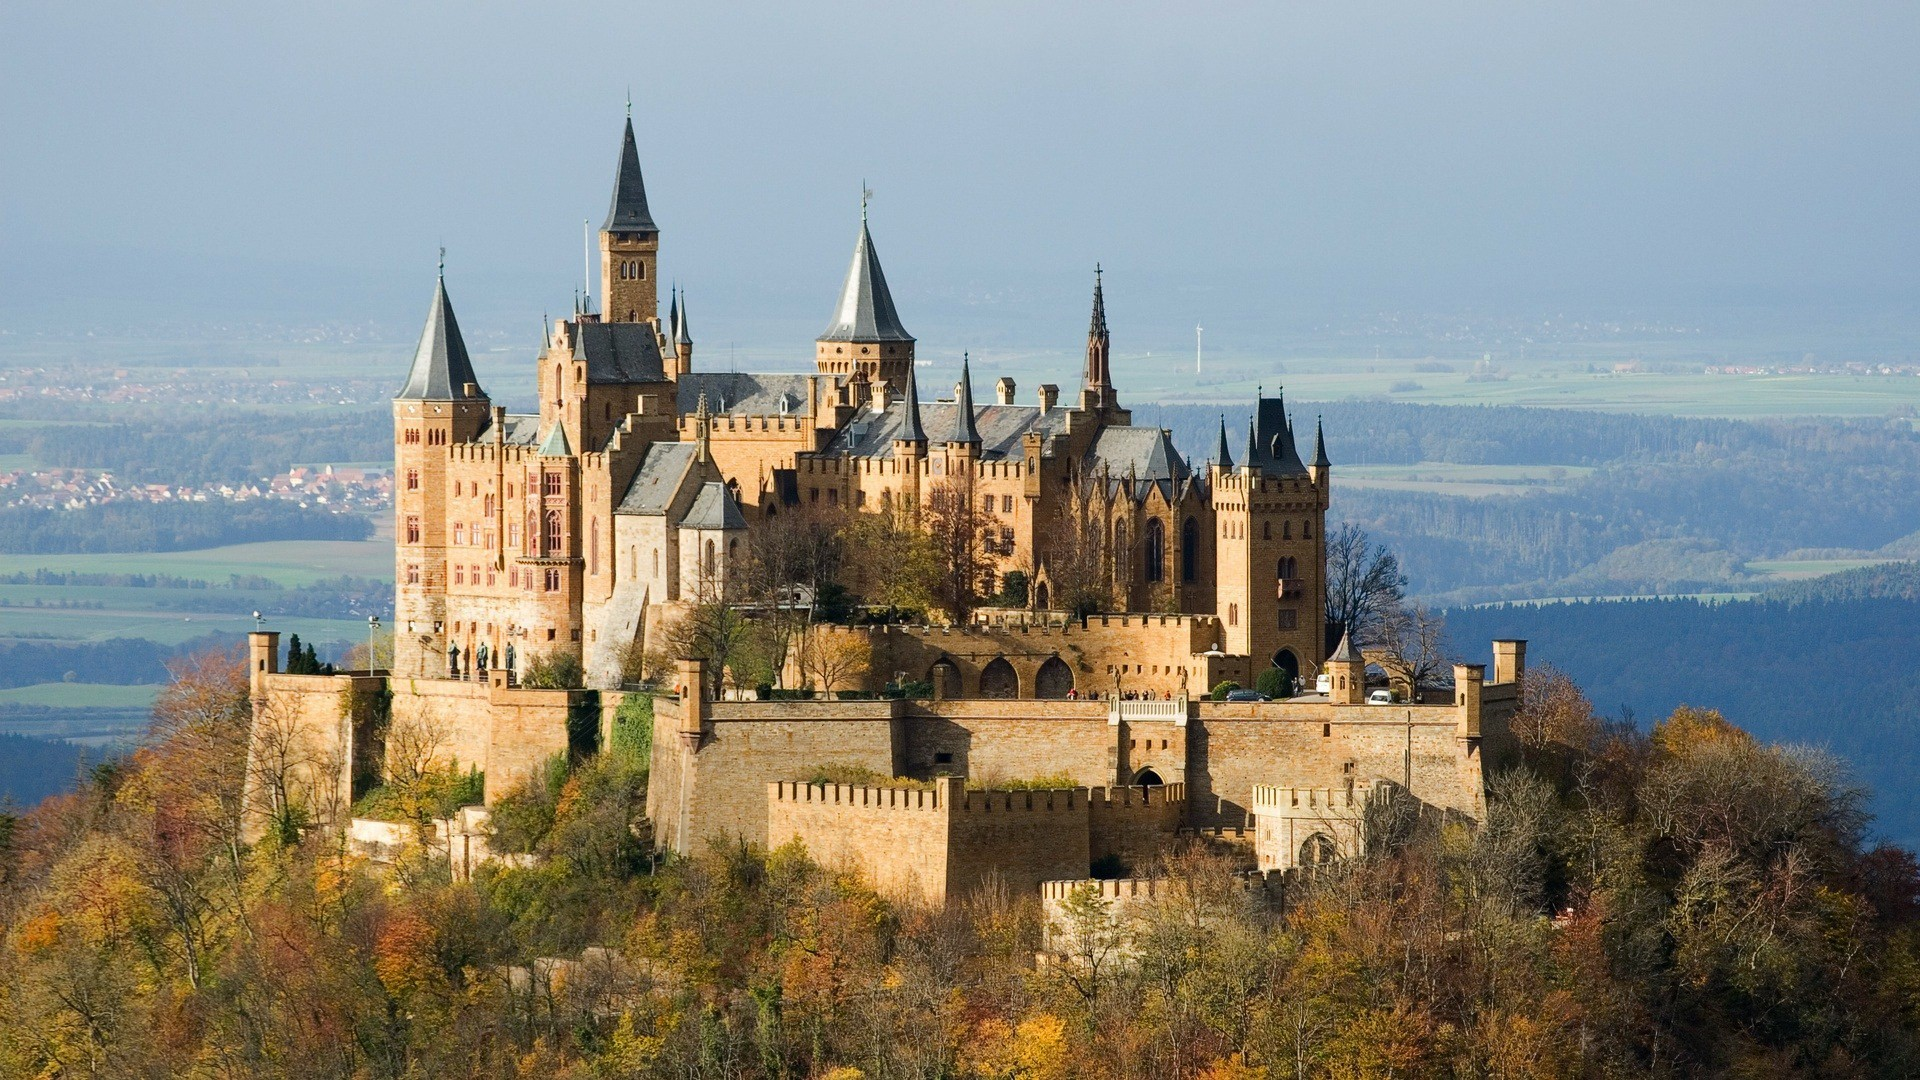 Castles Germany Wallpaper 1920x1080 Castles Germany Hohenzollern 1920x1080